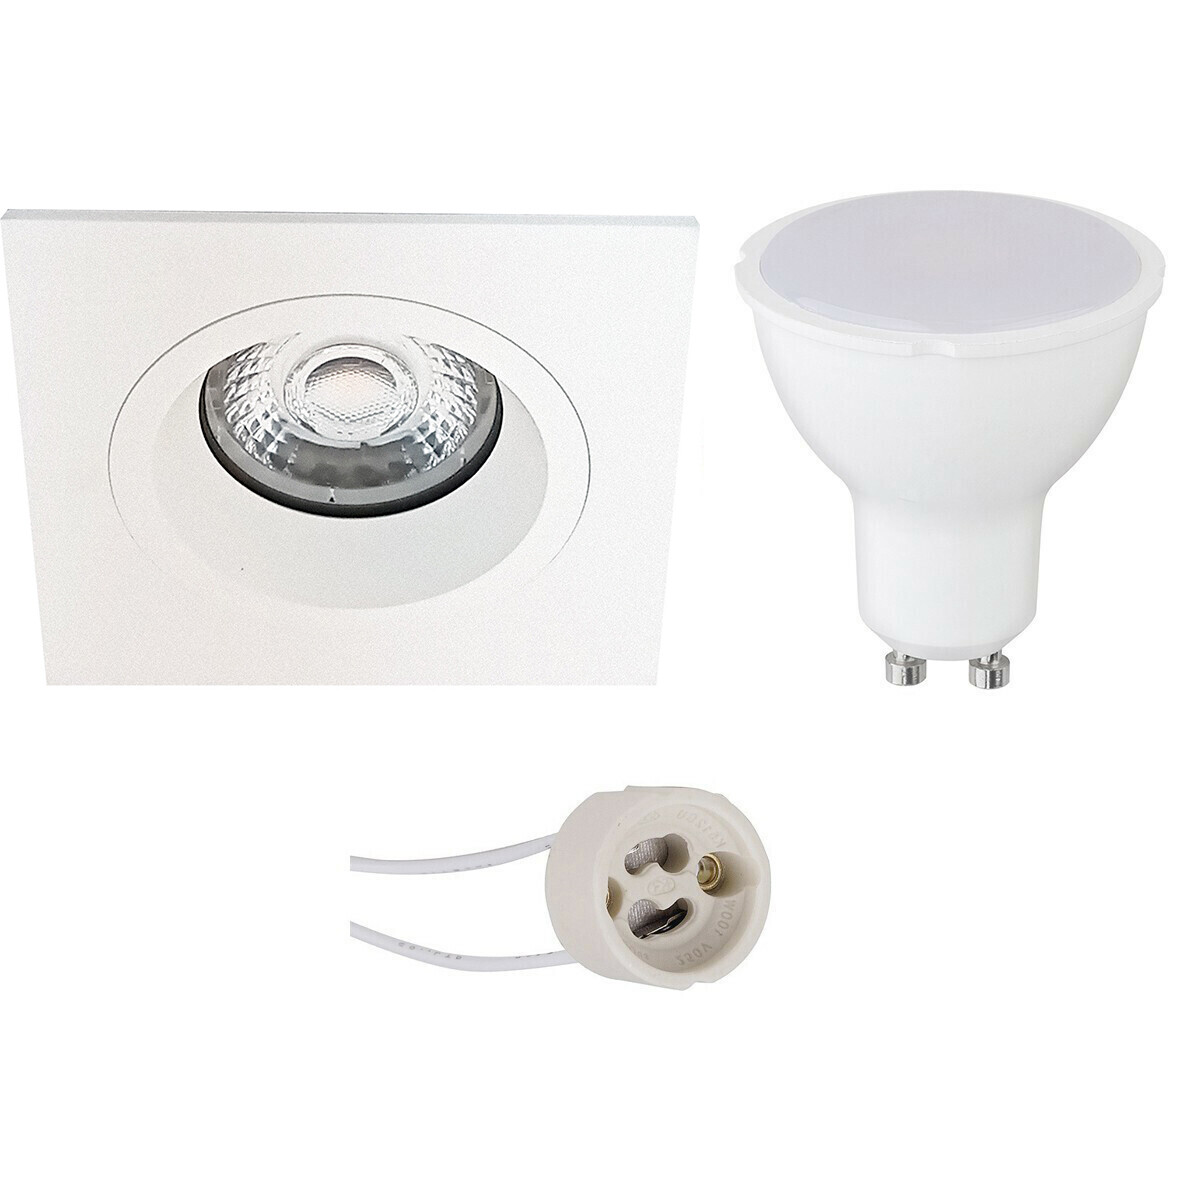 LED Spot Set - Pragmi Rodos Pro - GU10 Fitting - Dimbaar - Inbouw Vierkant - Mat Wit - 6W - Helder/K